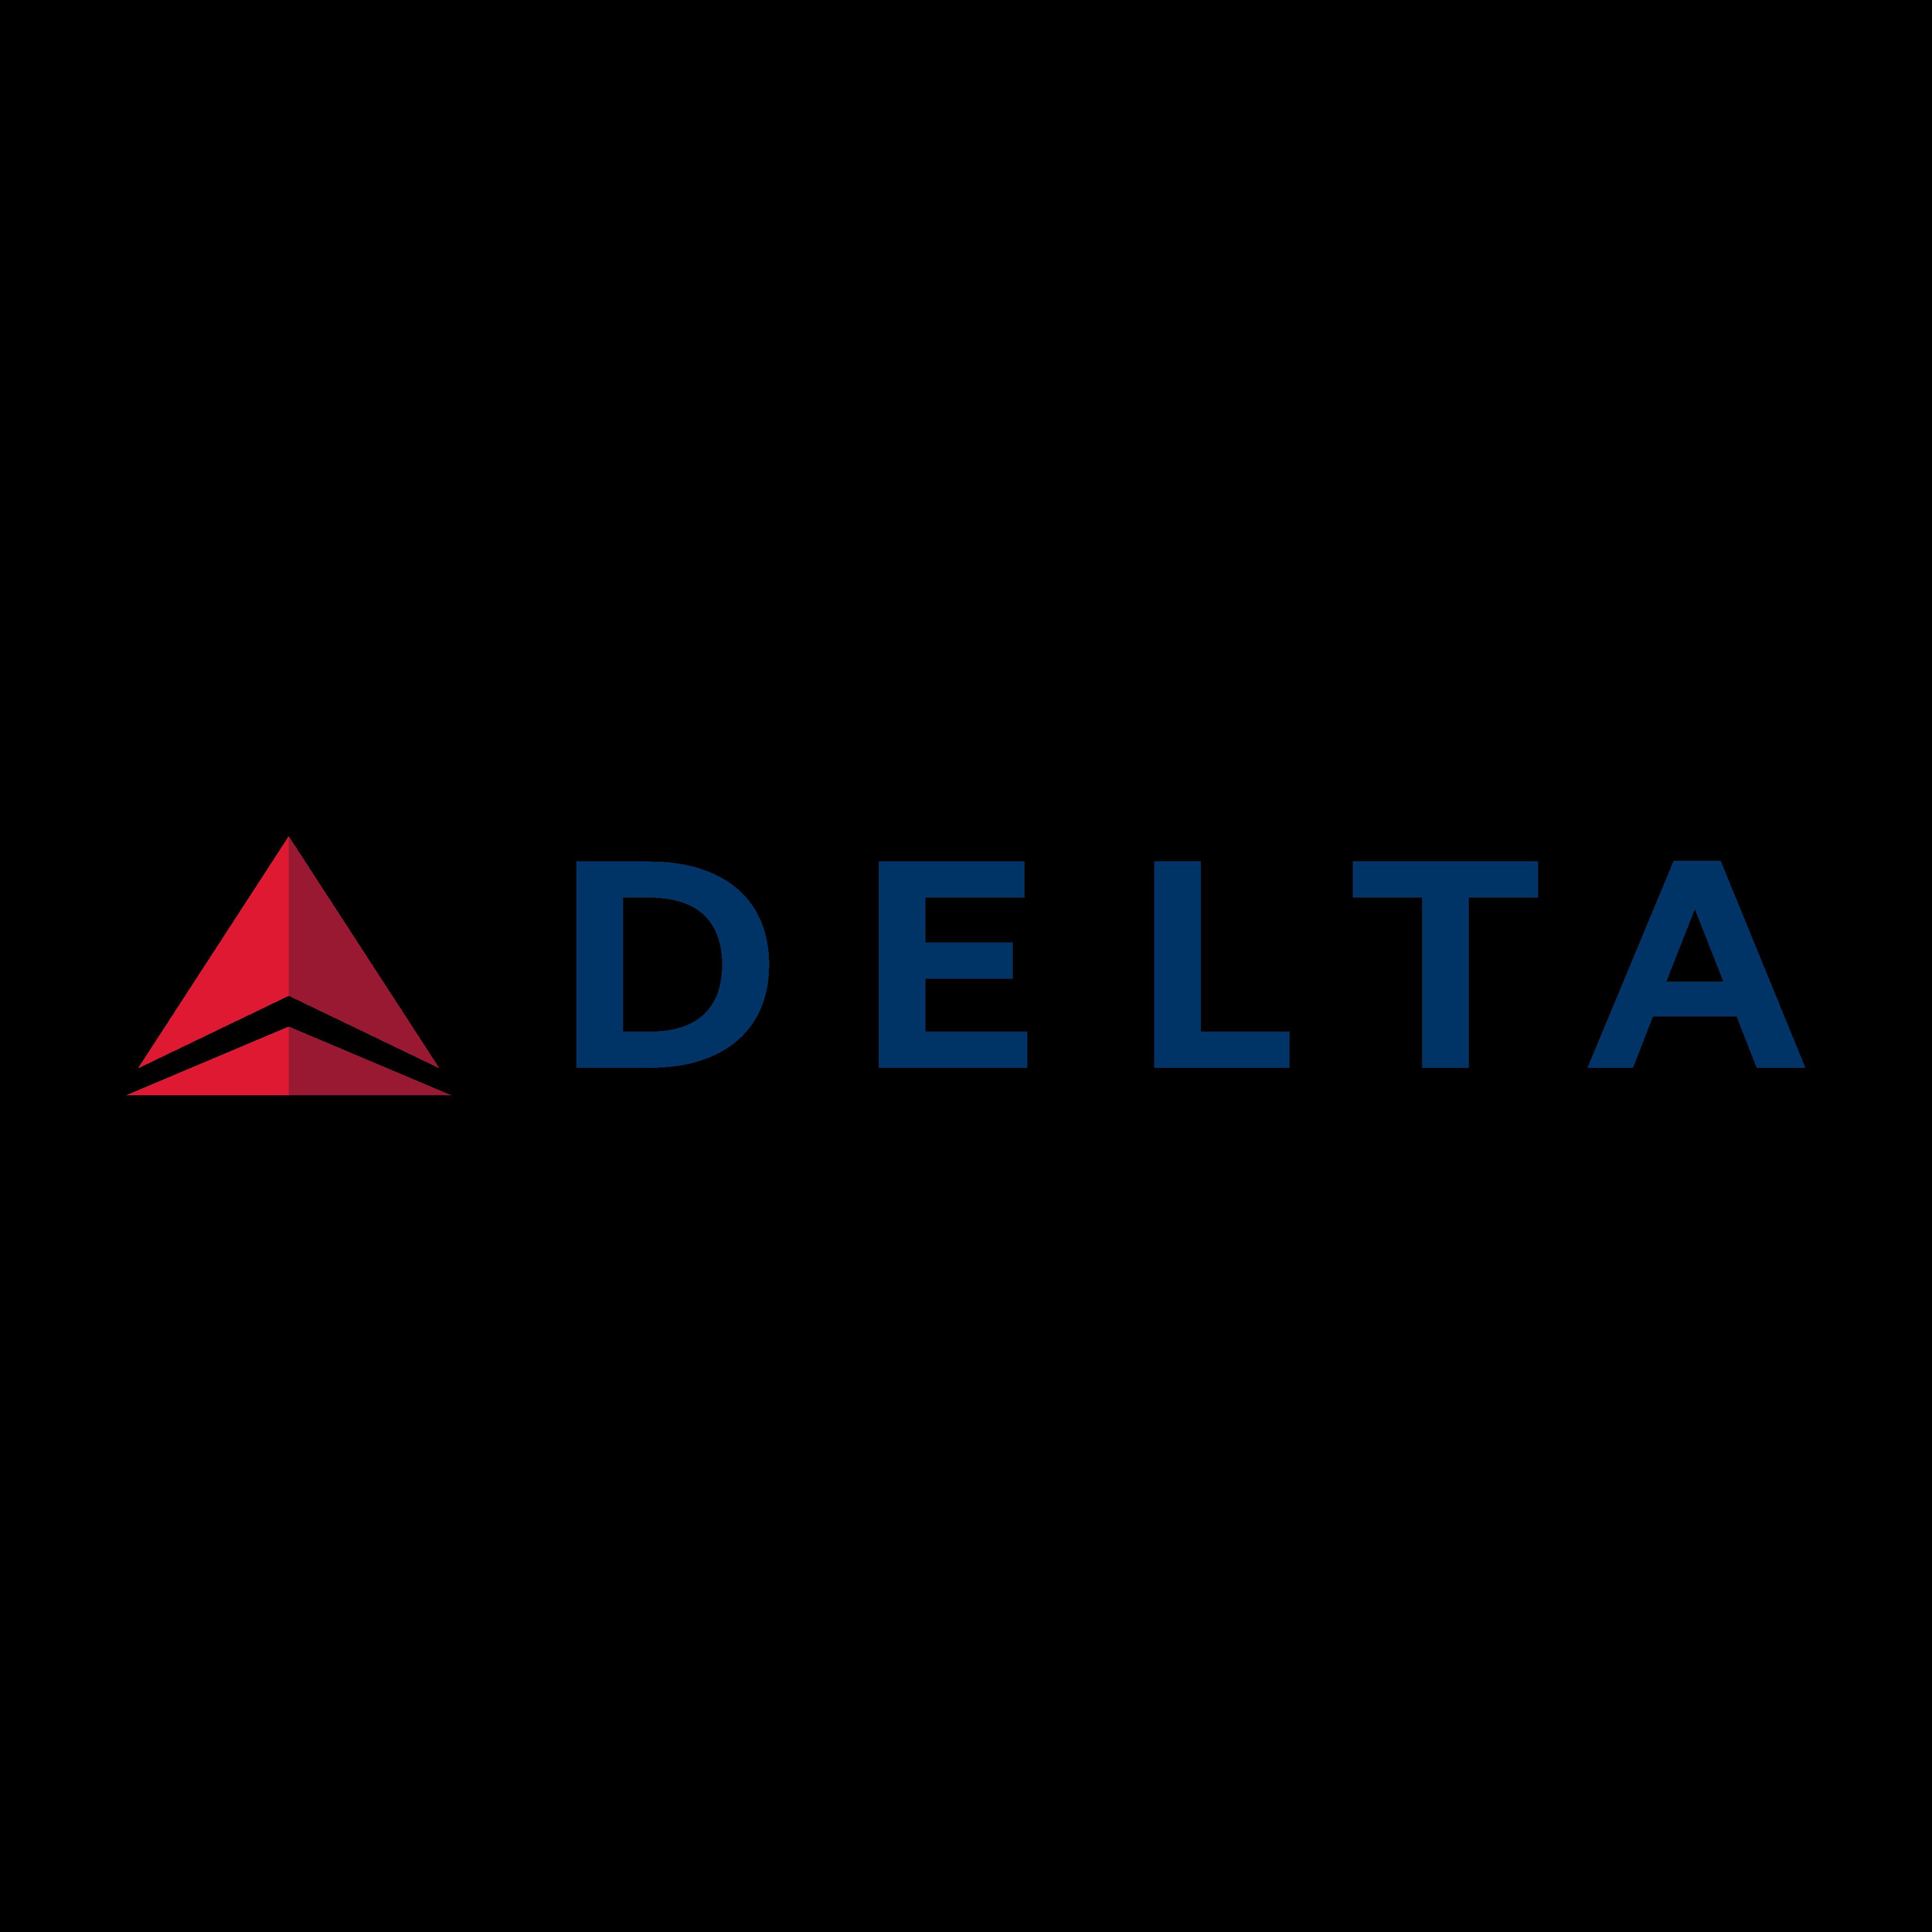 delta air lines logo 0 - Delta Air Lines Logo